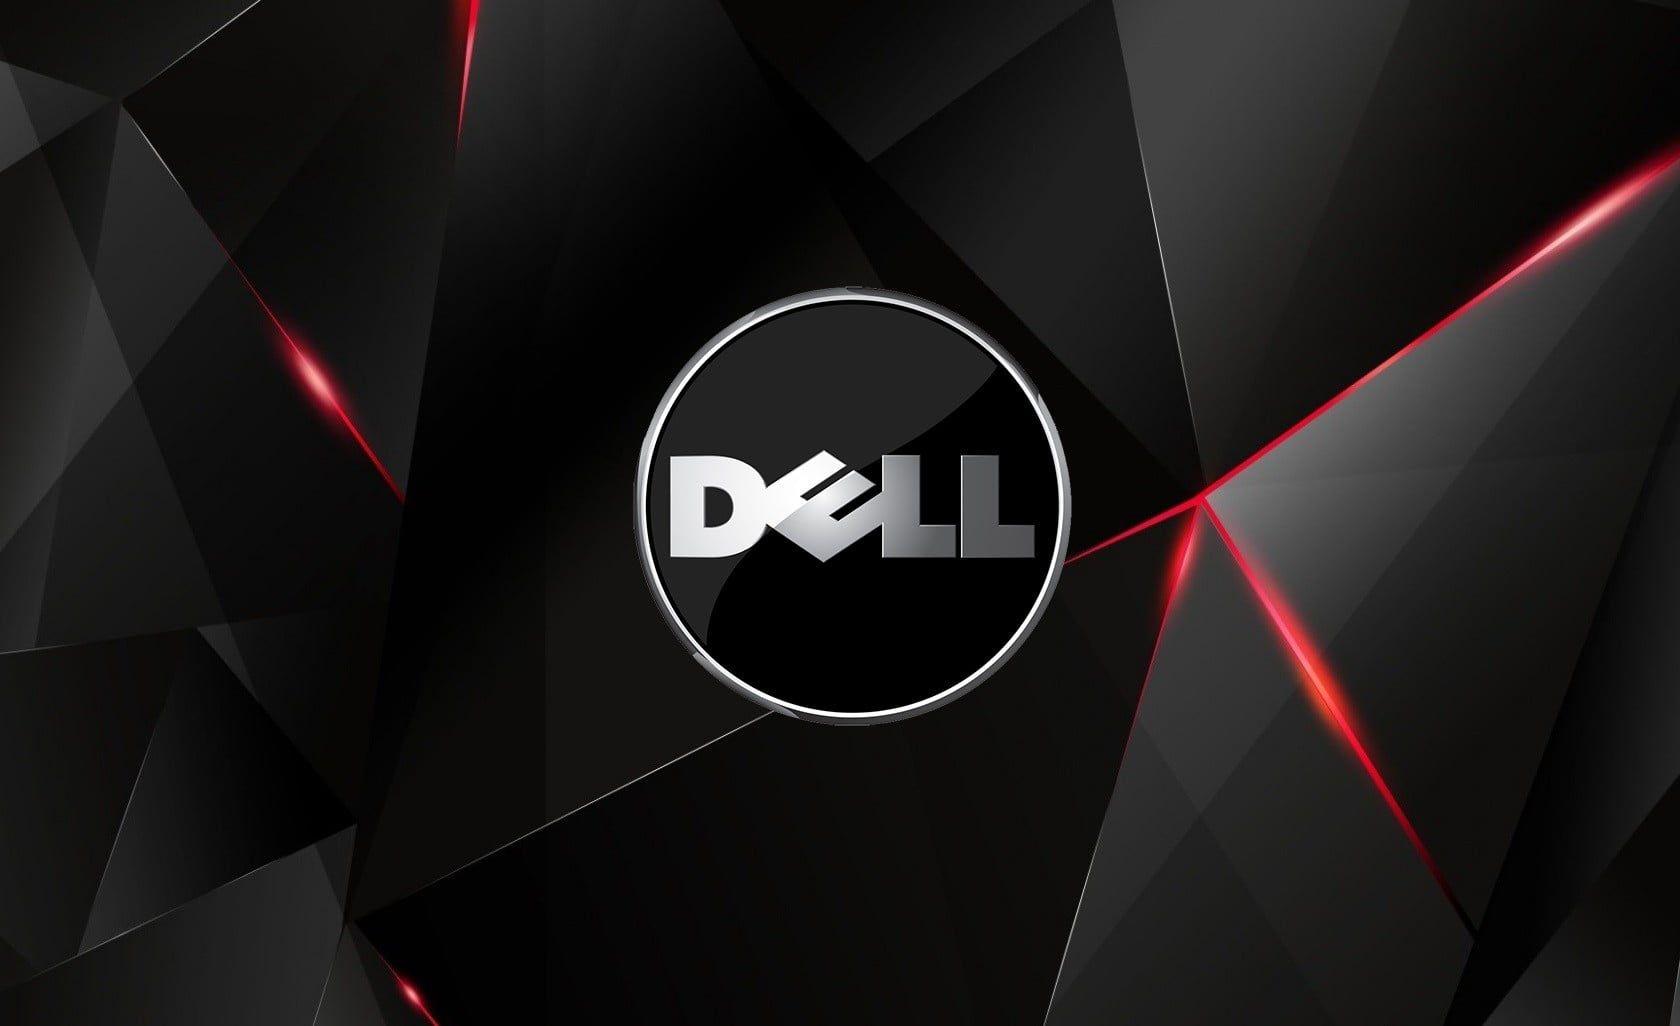 Black And White Dallas Cowboys Logo Computer Dell 720p Wallpaper Hdwallpaper Desktop Laptop Wallpaper Dell Laptops Dell Logo